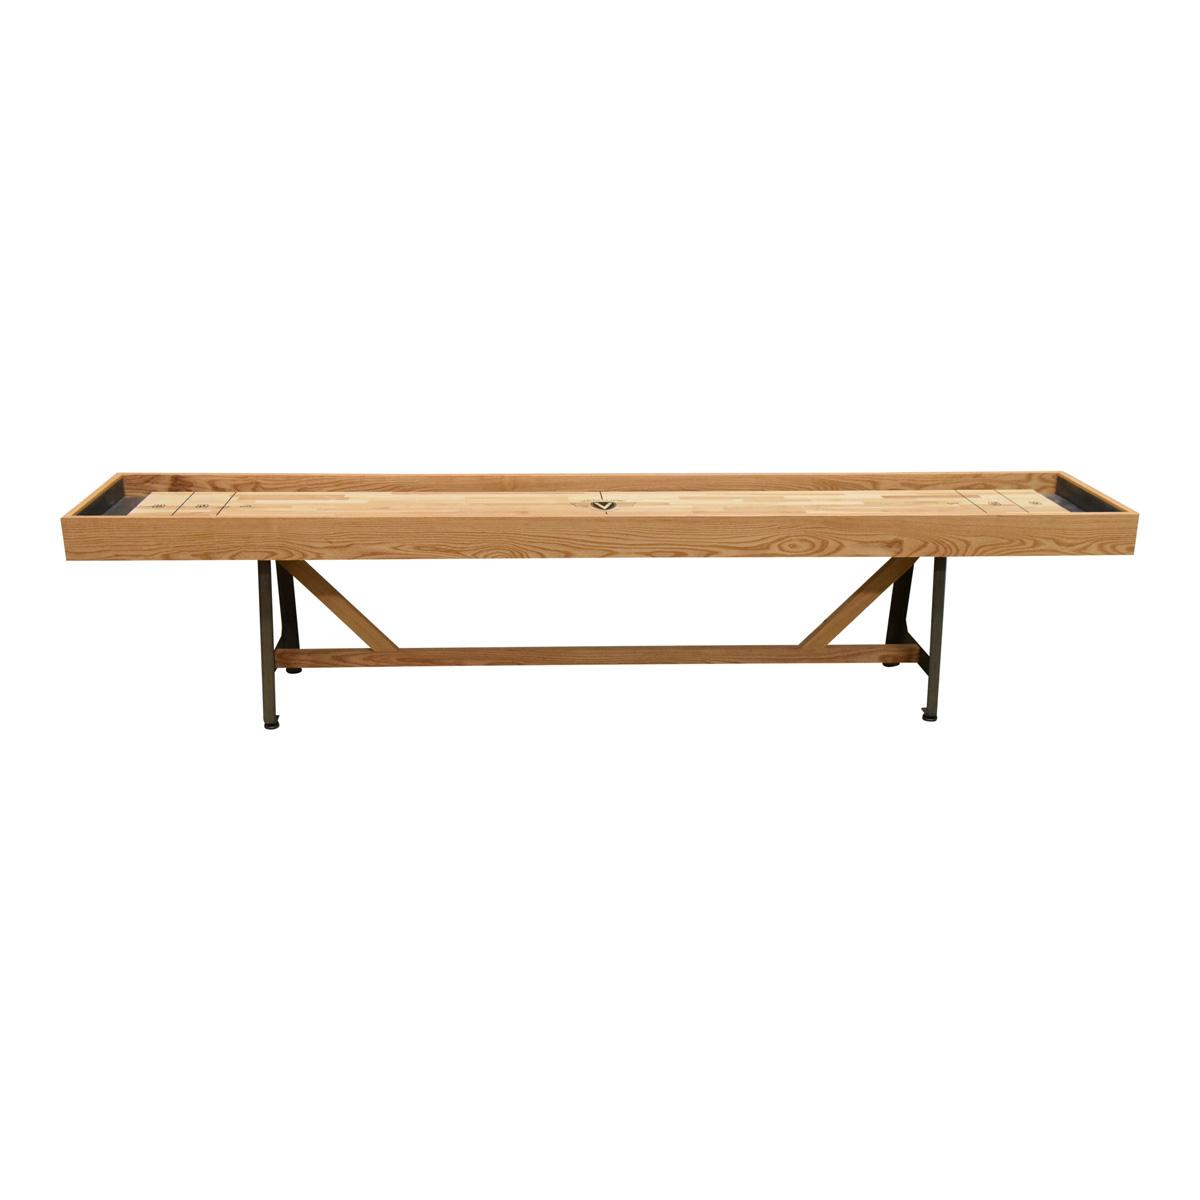 12' Astoria Sport Shuffleboard Table